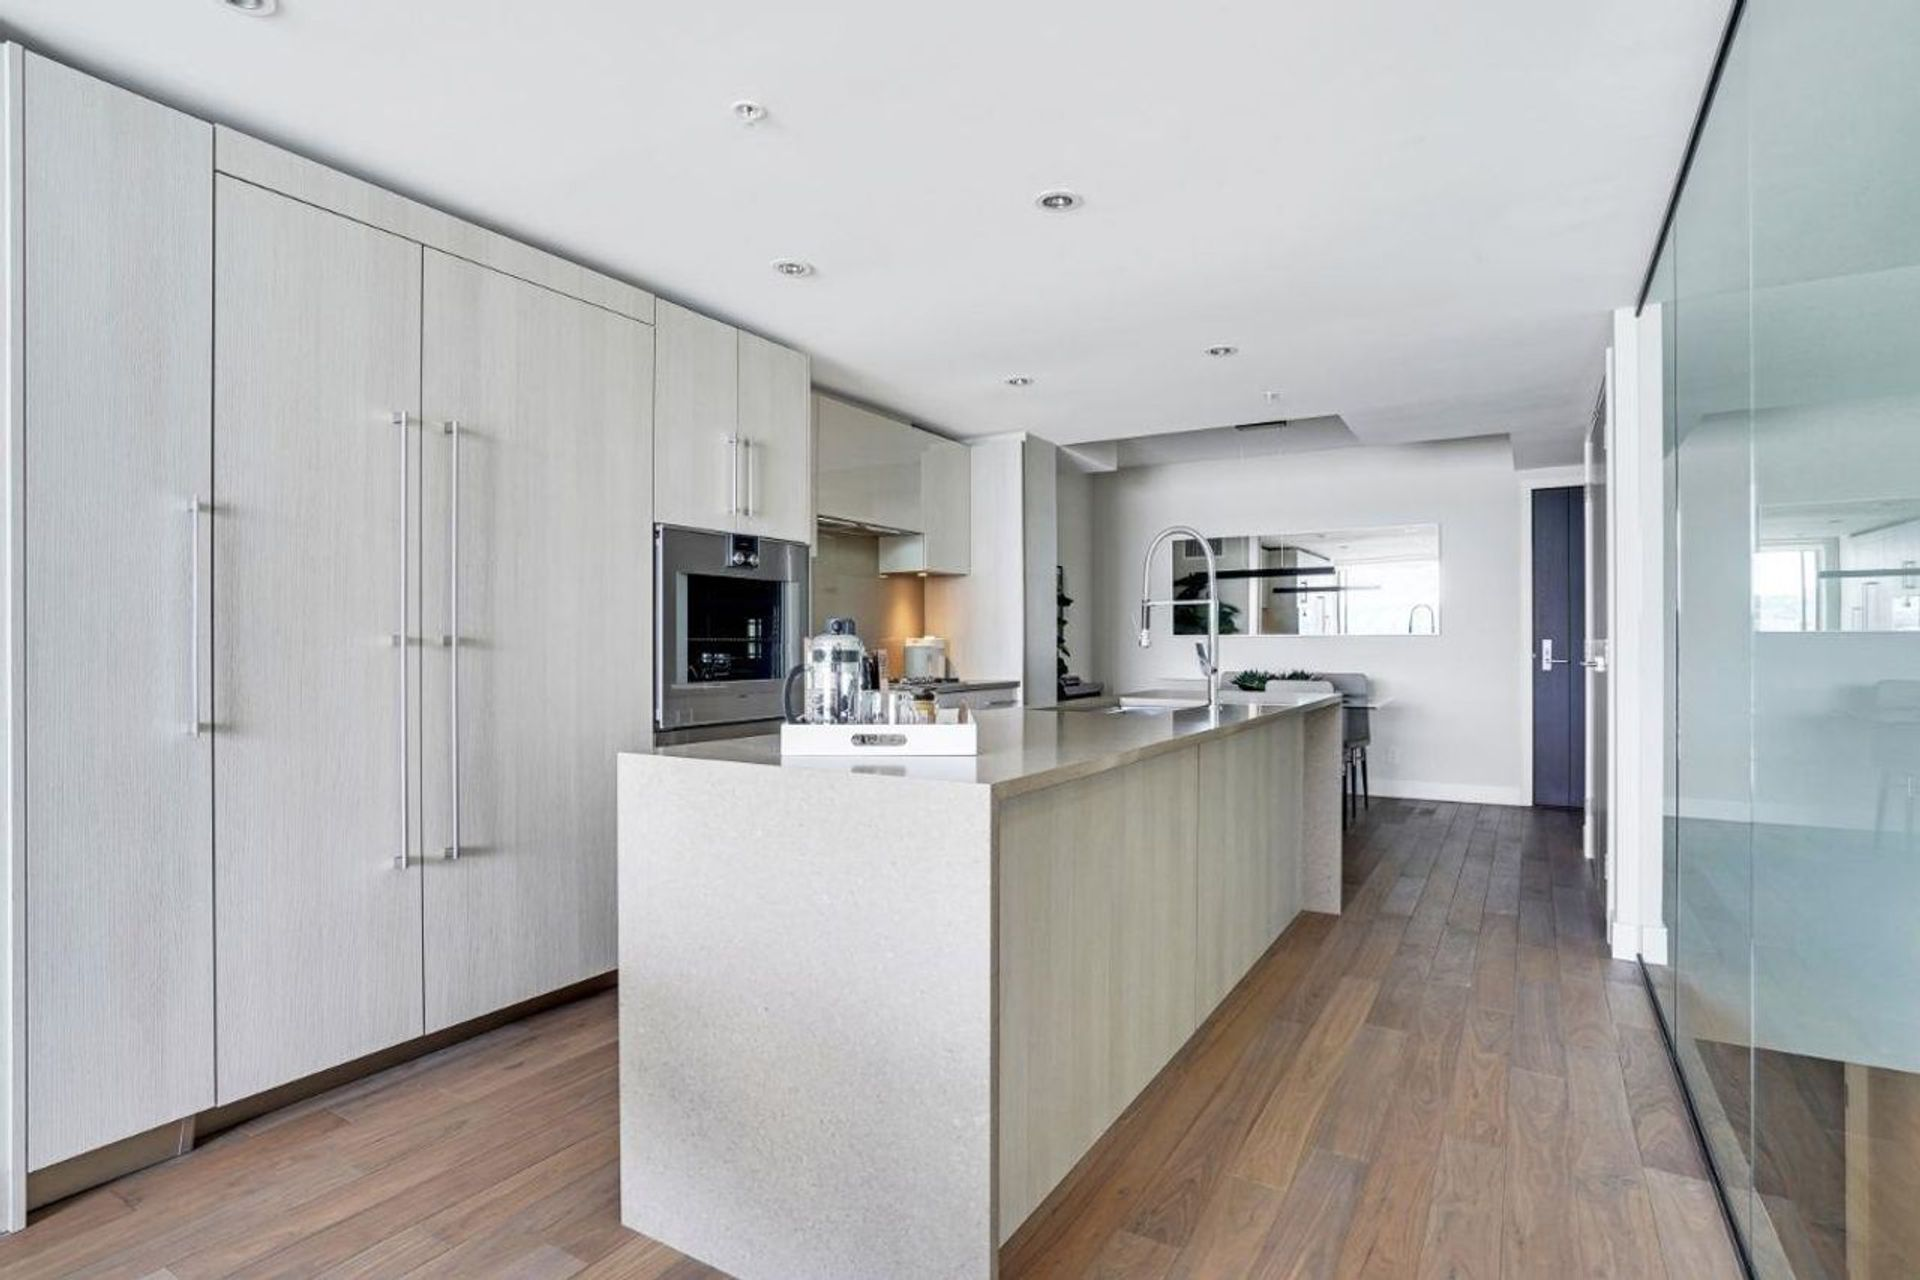 210-salter-street-queensborough-new-westminster-06 at TH509 - 210 Salter Street, Queensborough, New Westminster